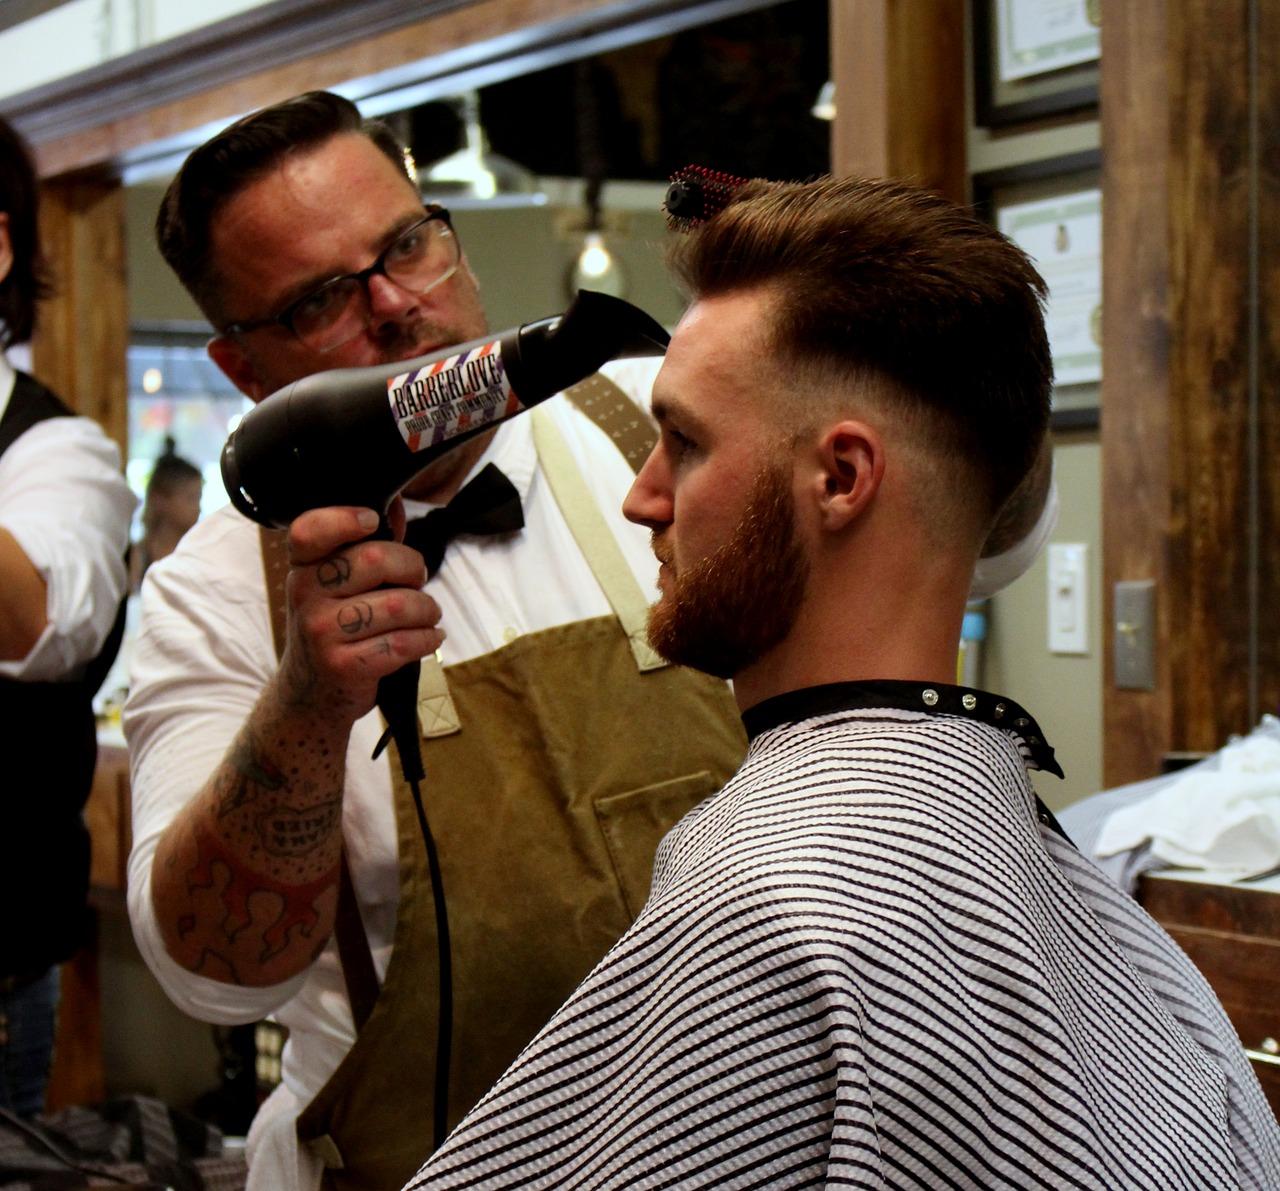 Barber Styling Mans Hair